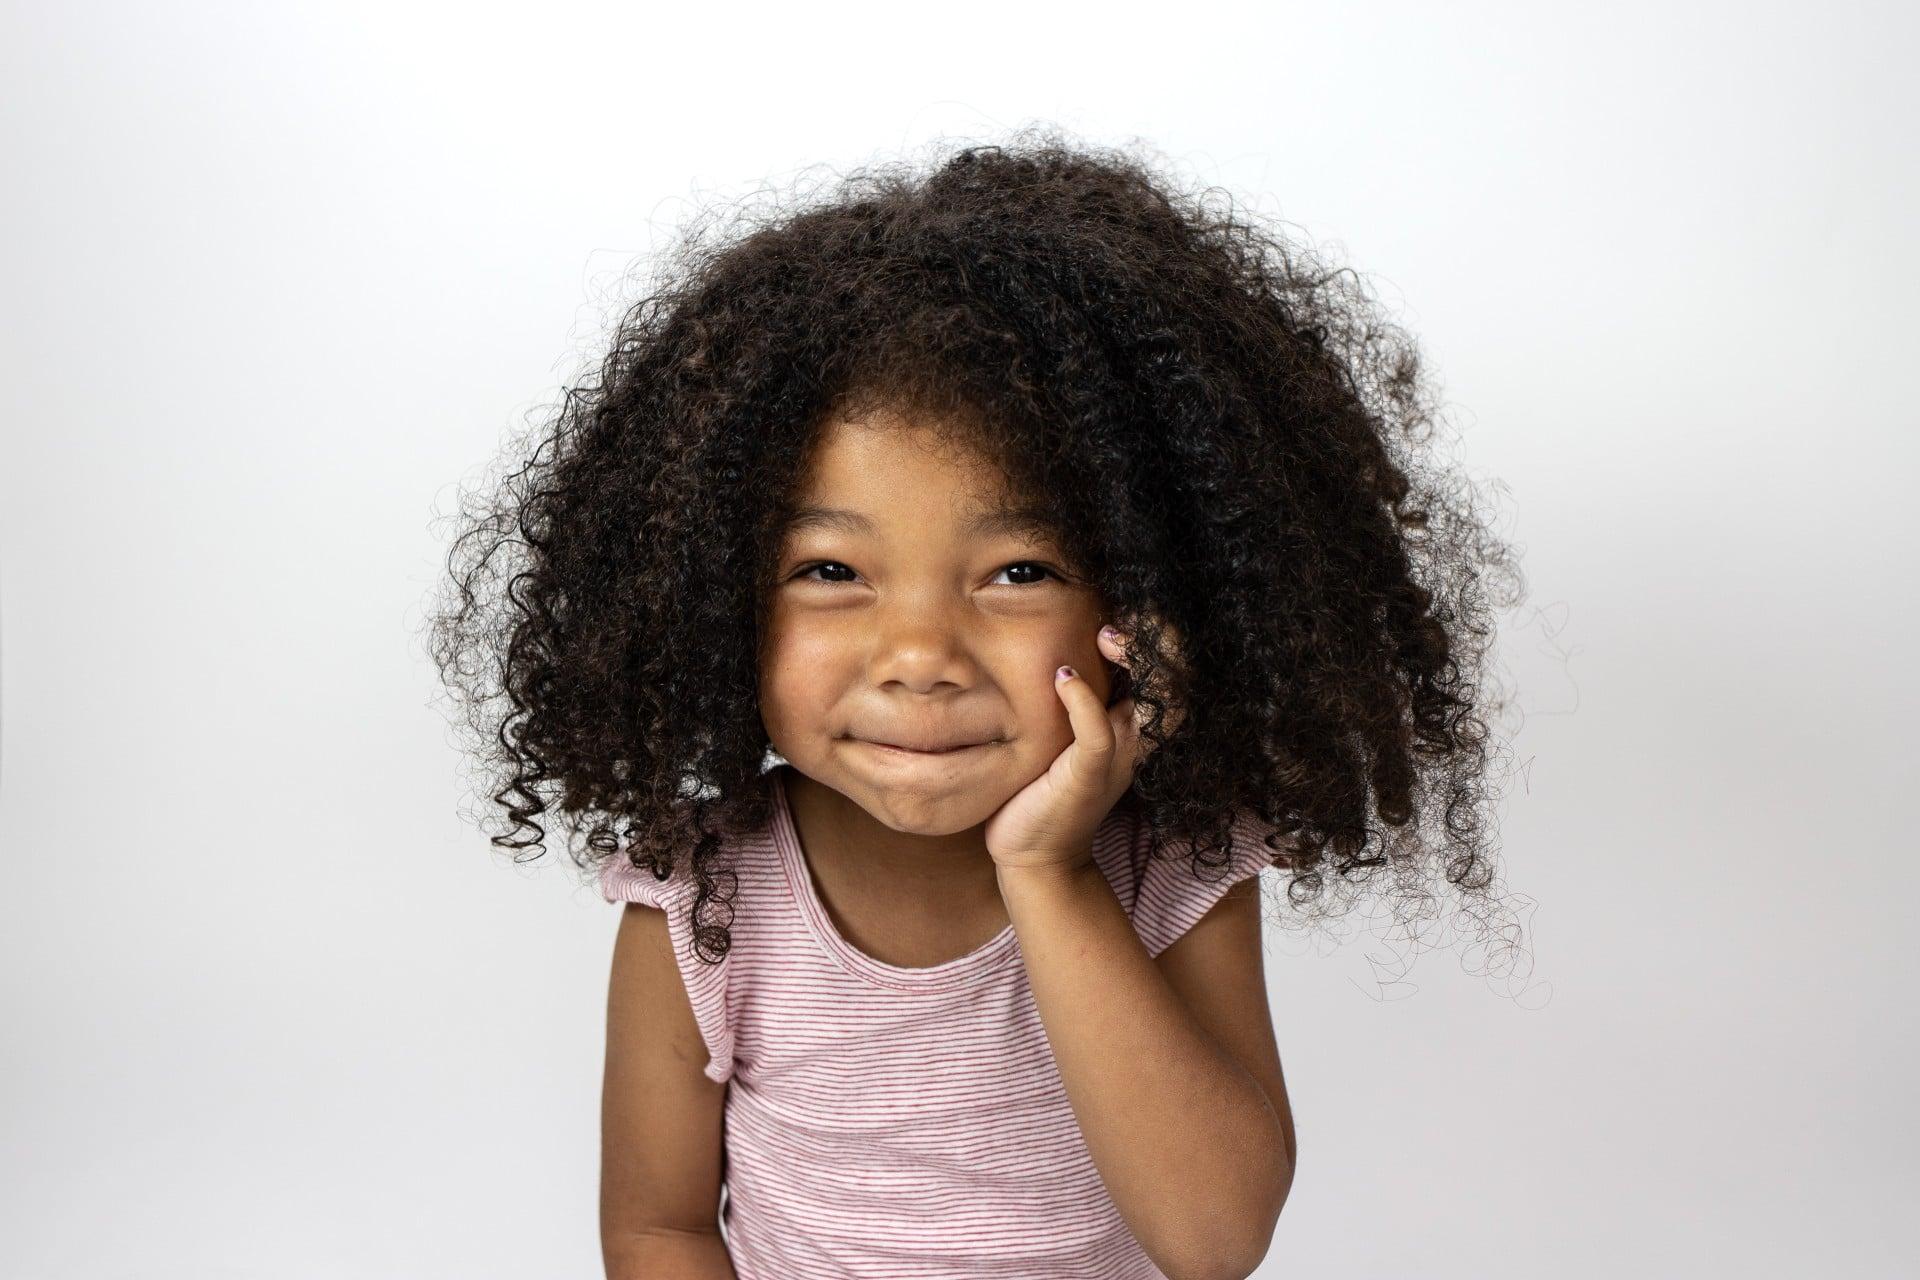 320-jennimachtfotos-Kinderbilder-BMaHDyZf